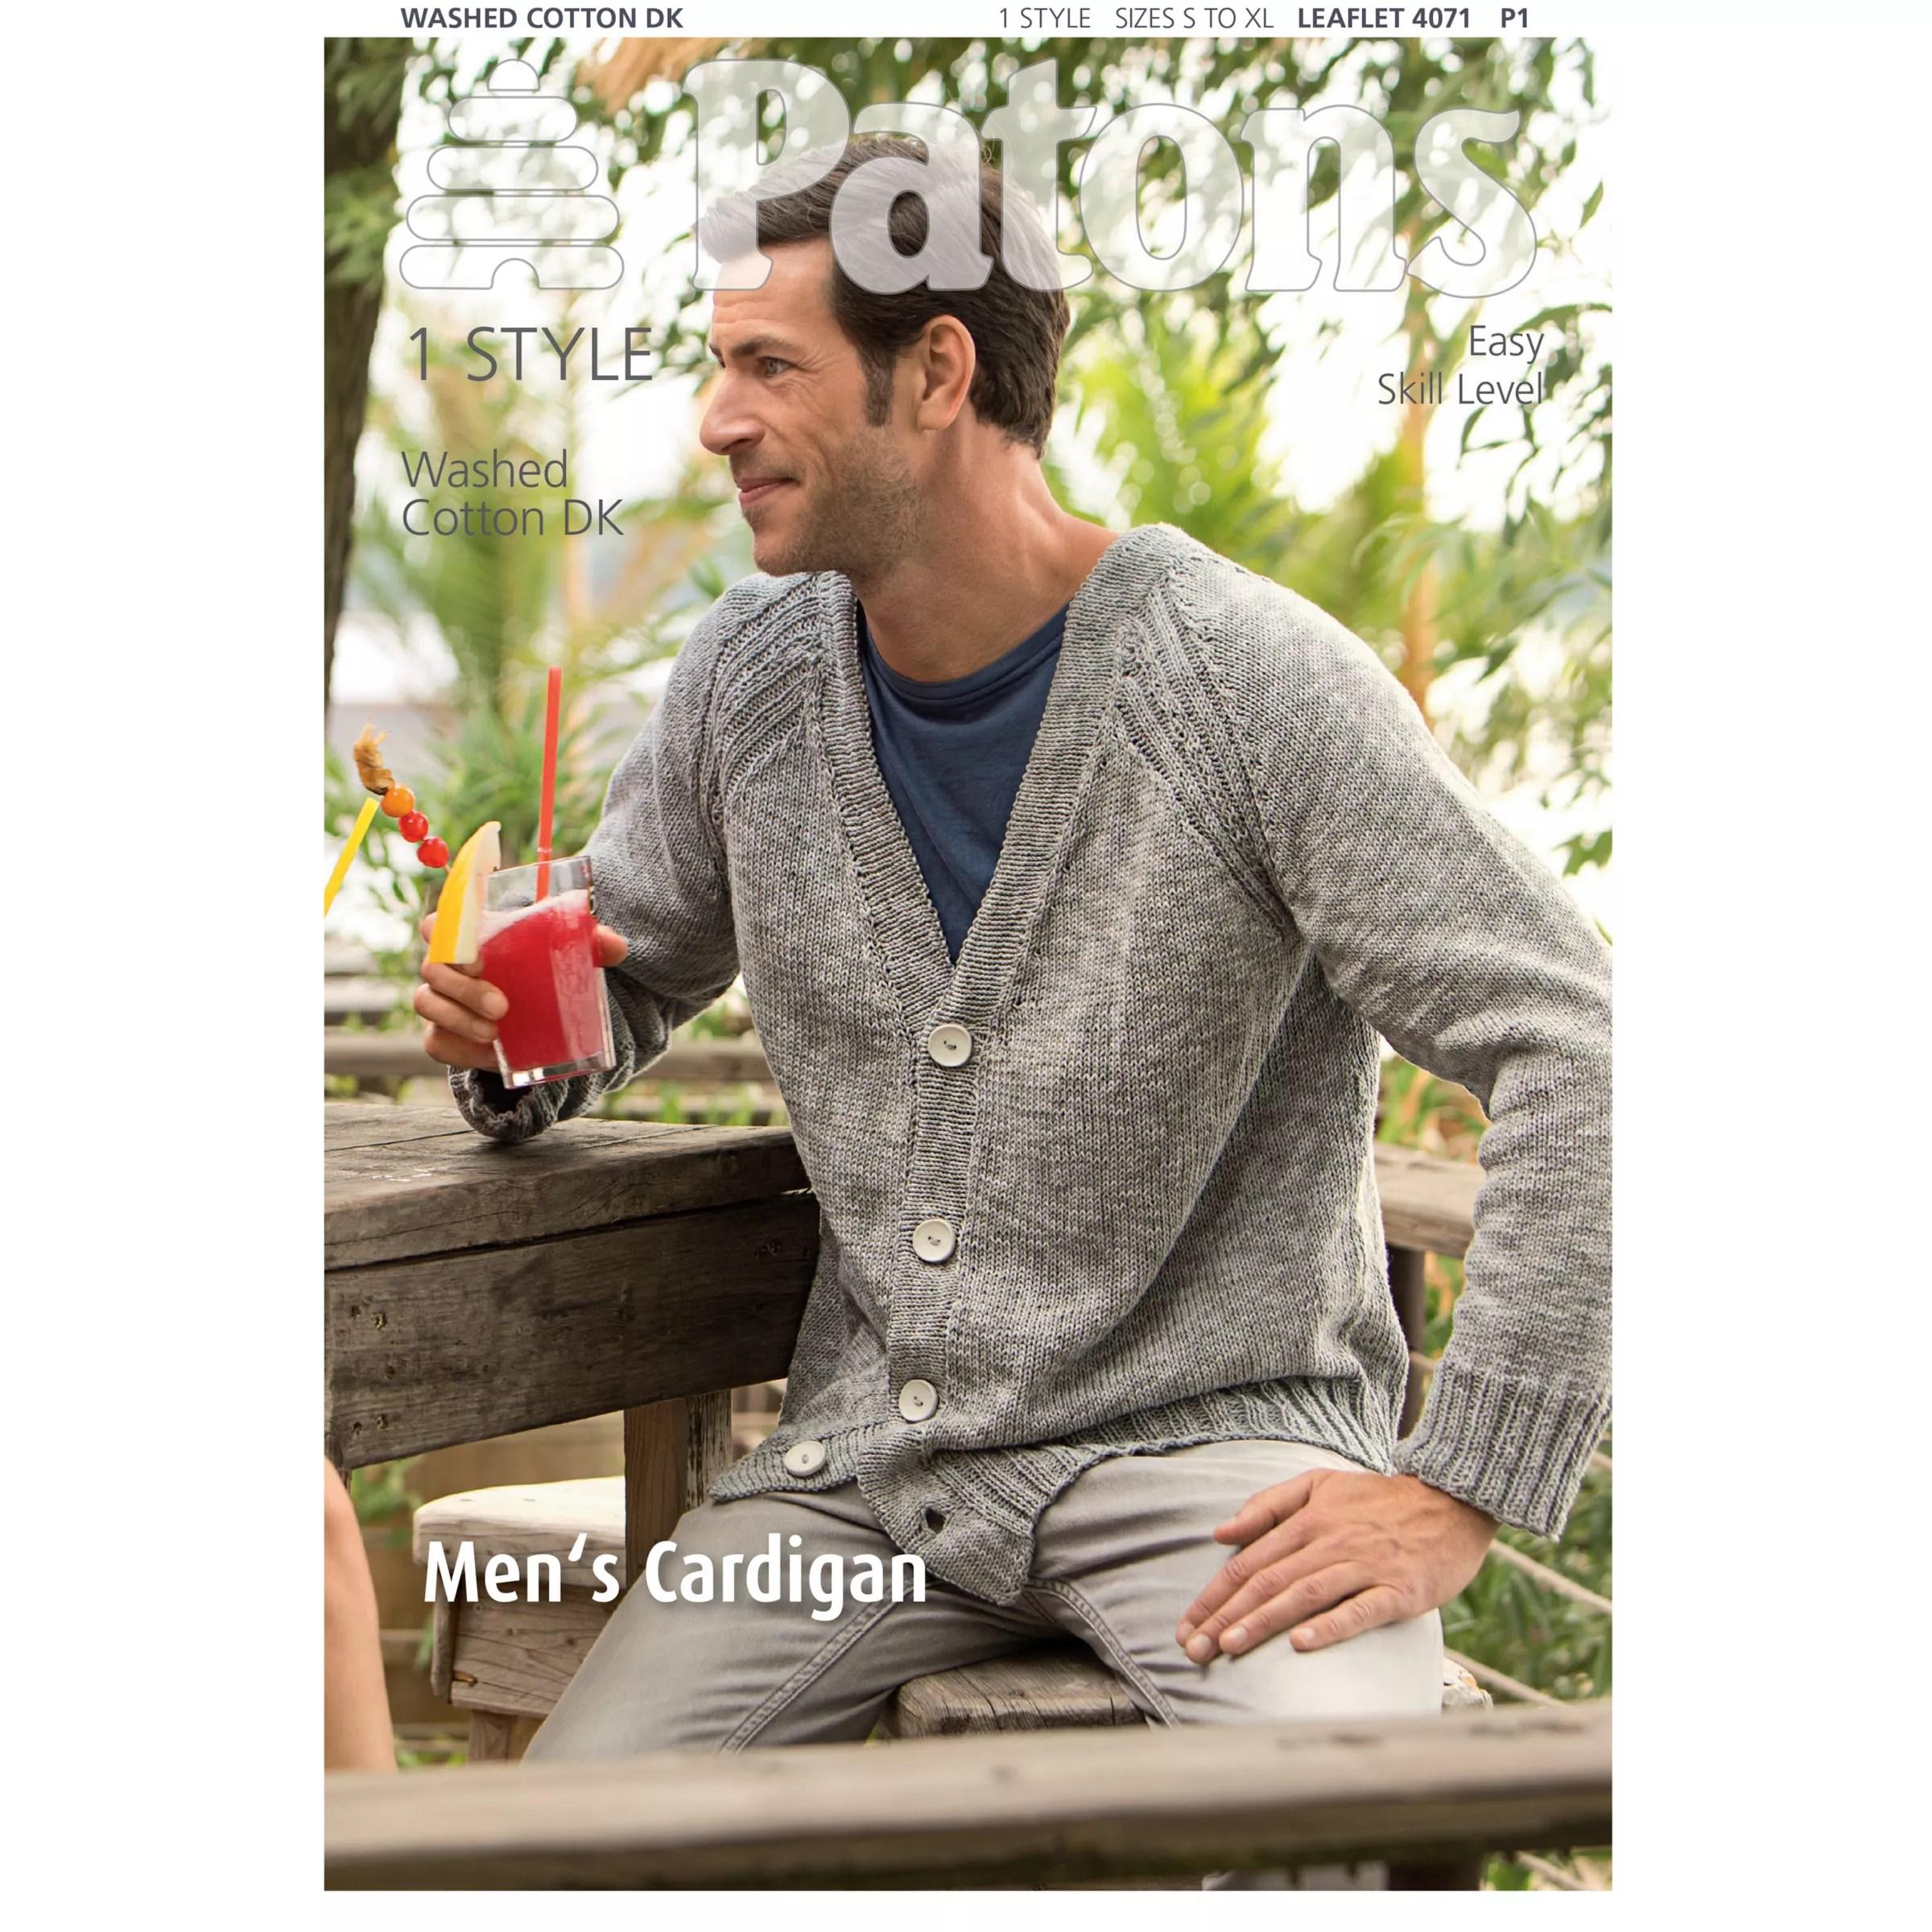 patons yarn washed cotton